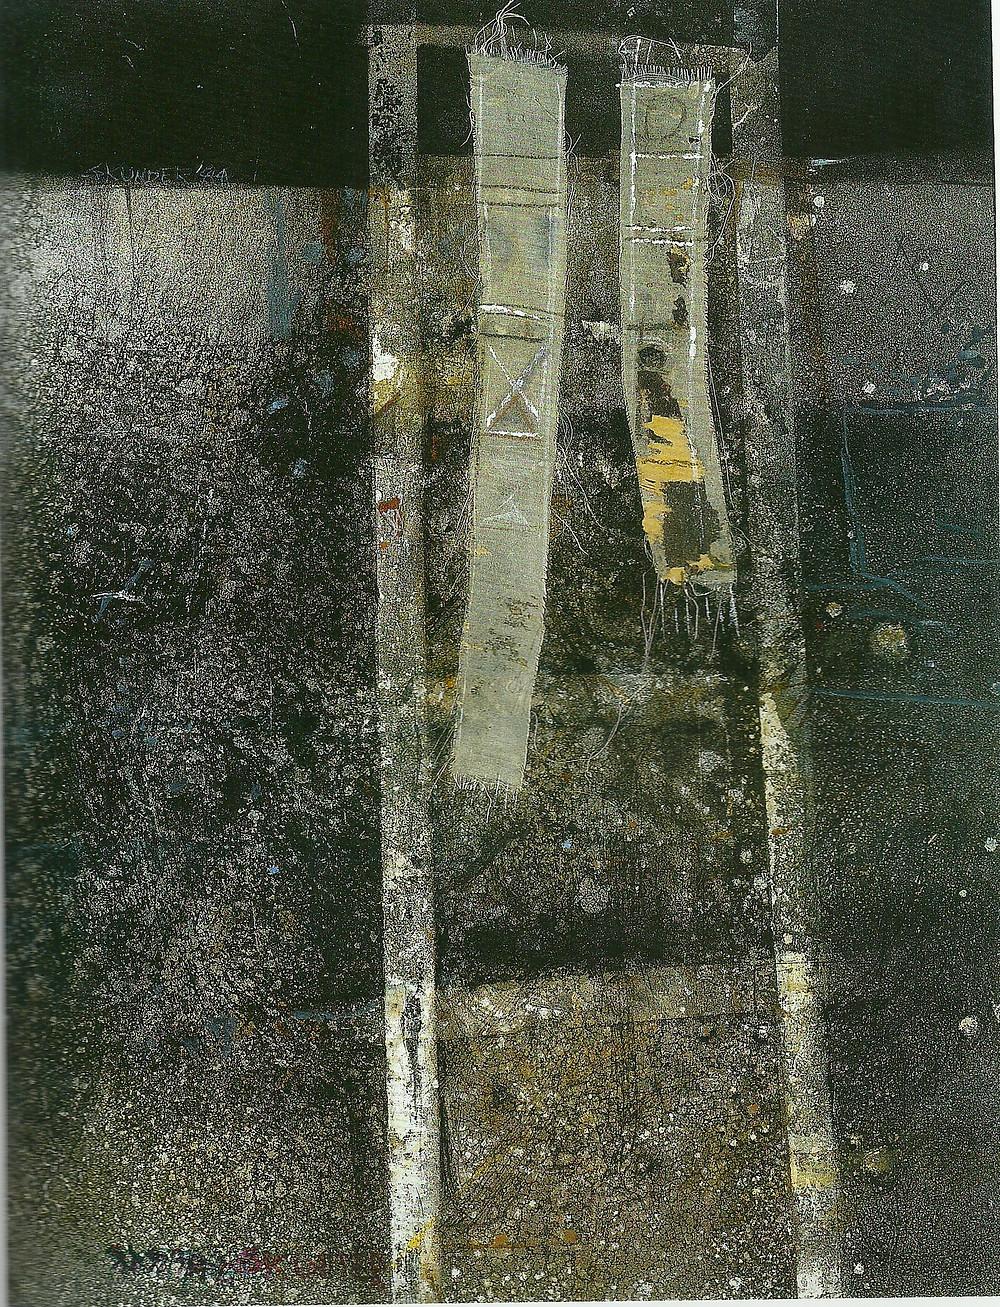 Skunder Boghossian, Jacob's Ladder, Mixed media on paper, 66X59, 1984